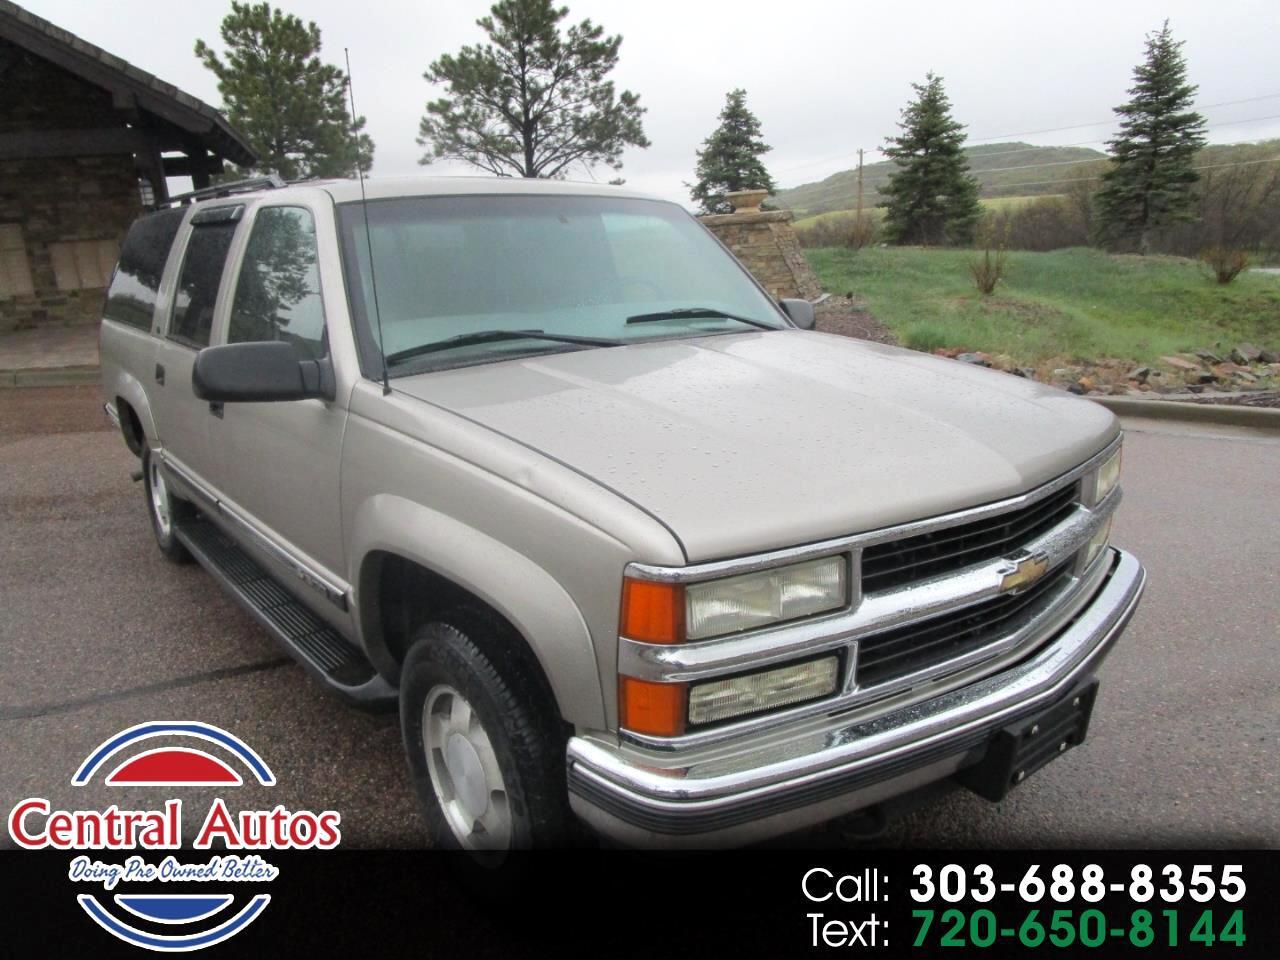 1999 Chevrolet Suburban 1500 4wd LT